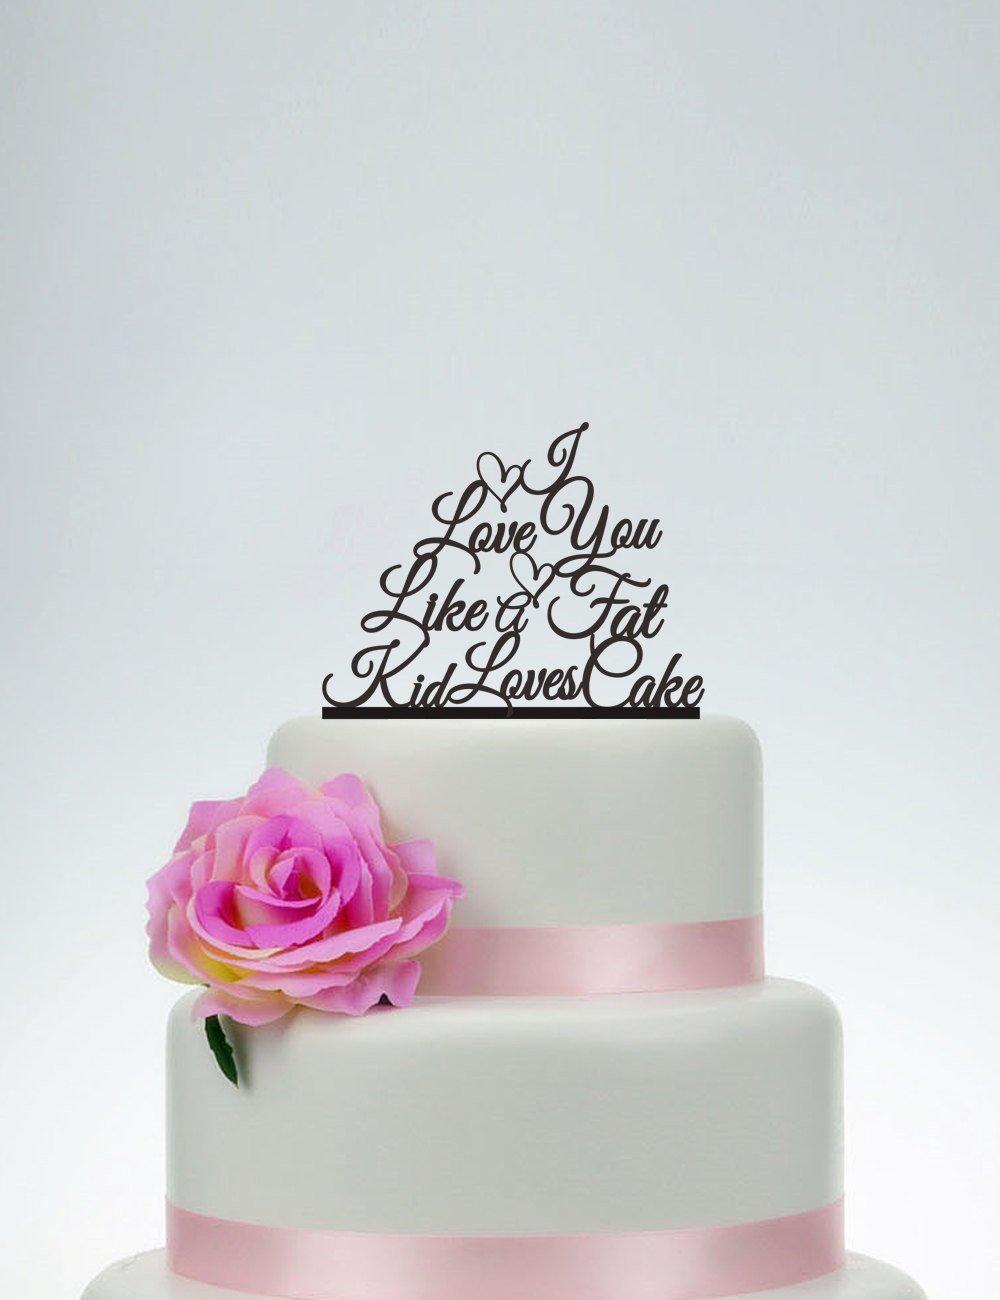 Cheap Fat Wedding, find Fat Wedding deals on line at Alibaba.com